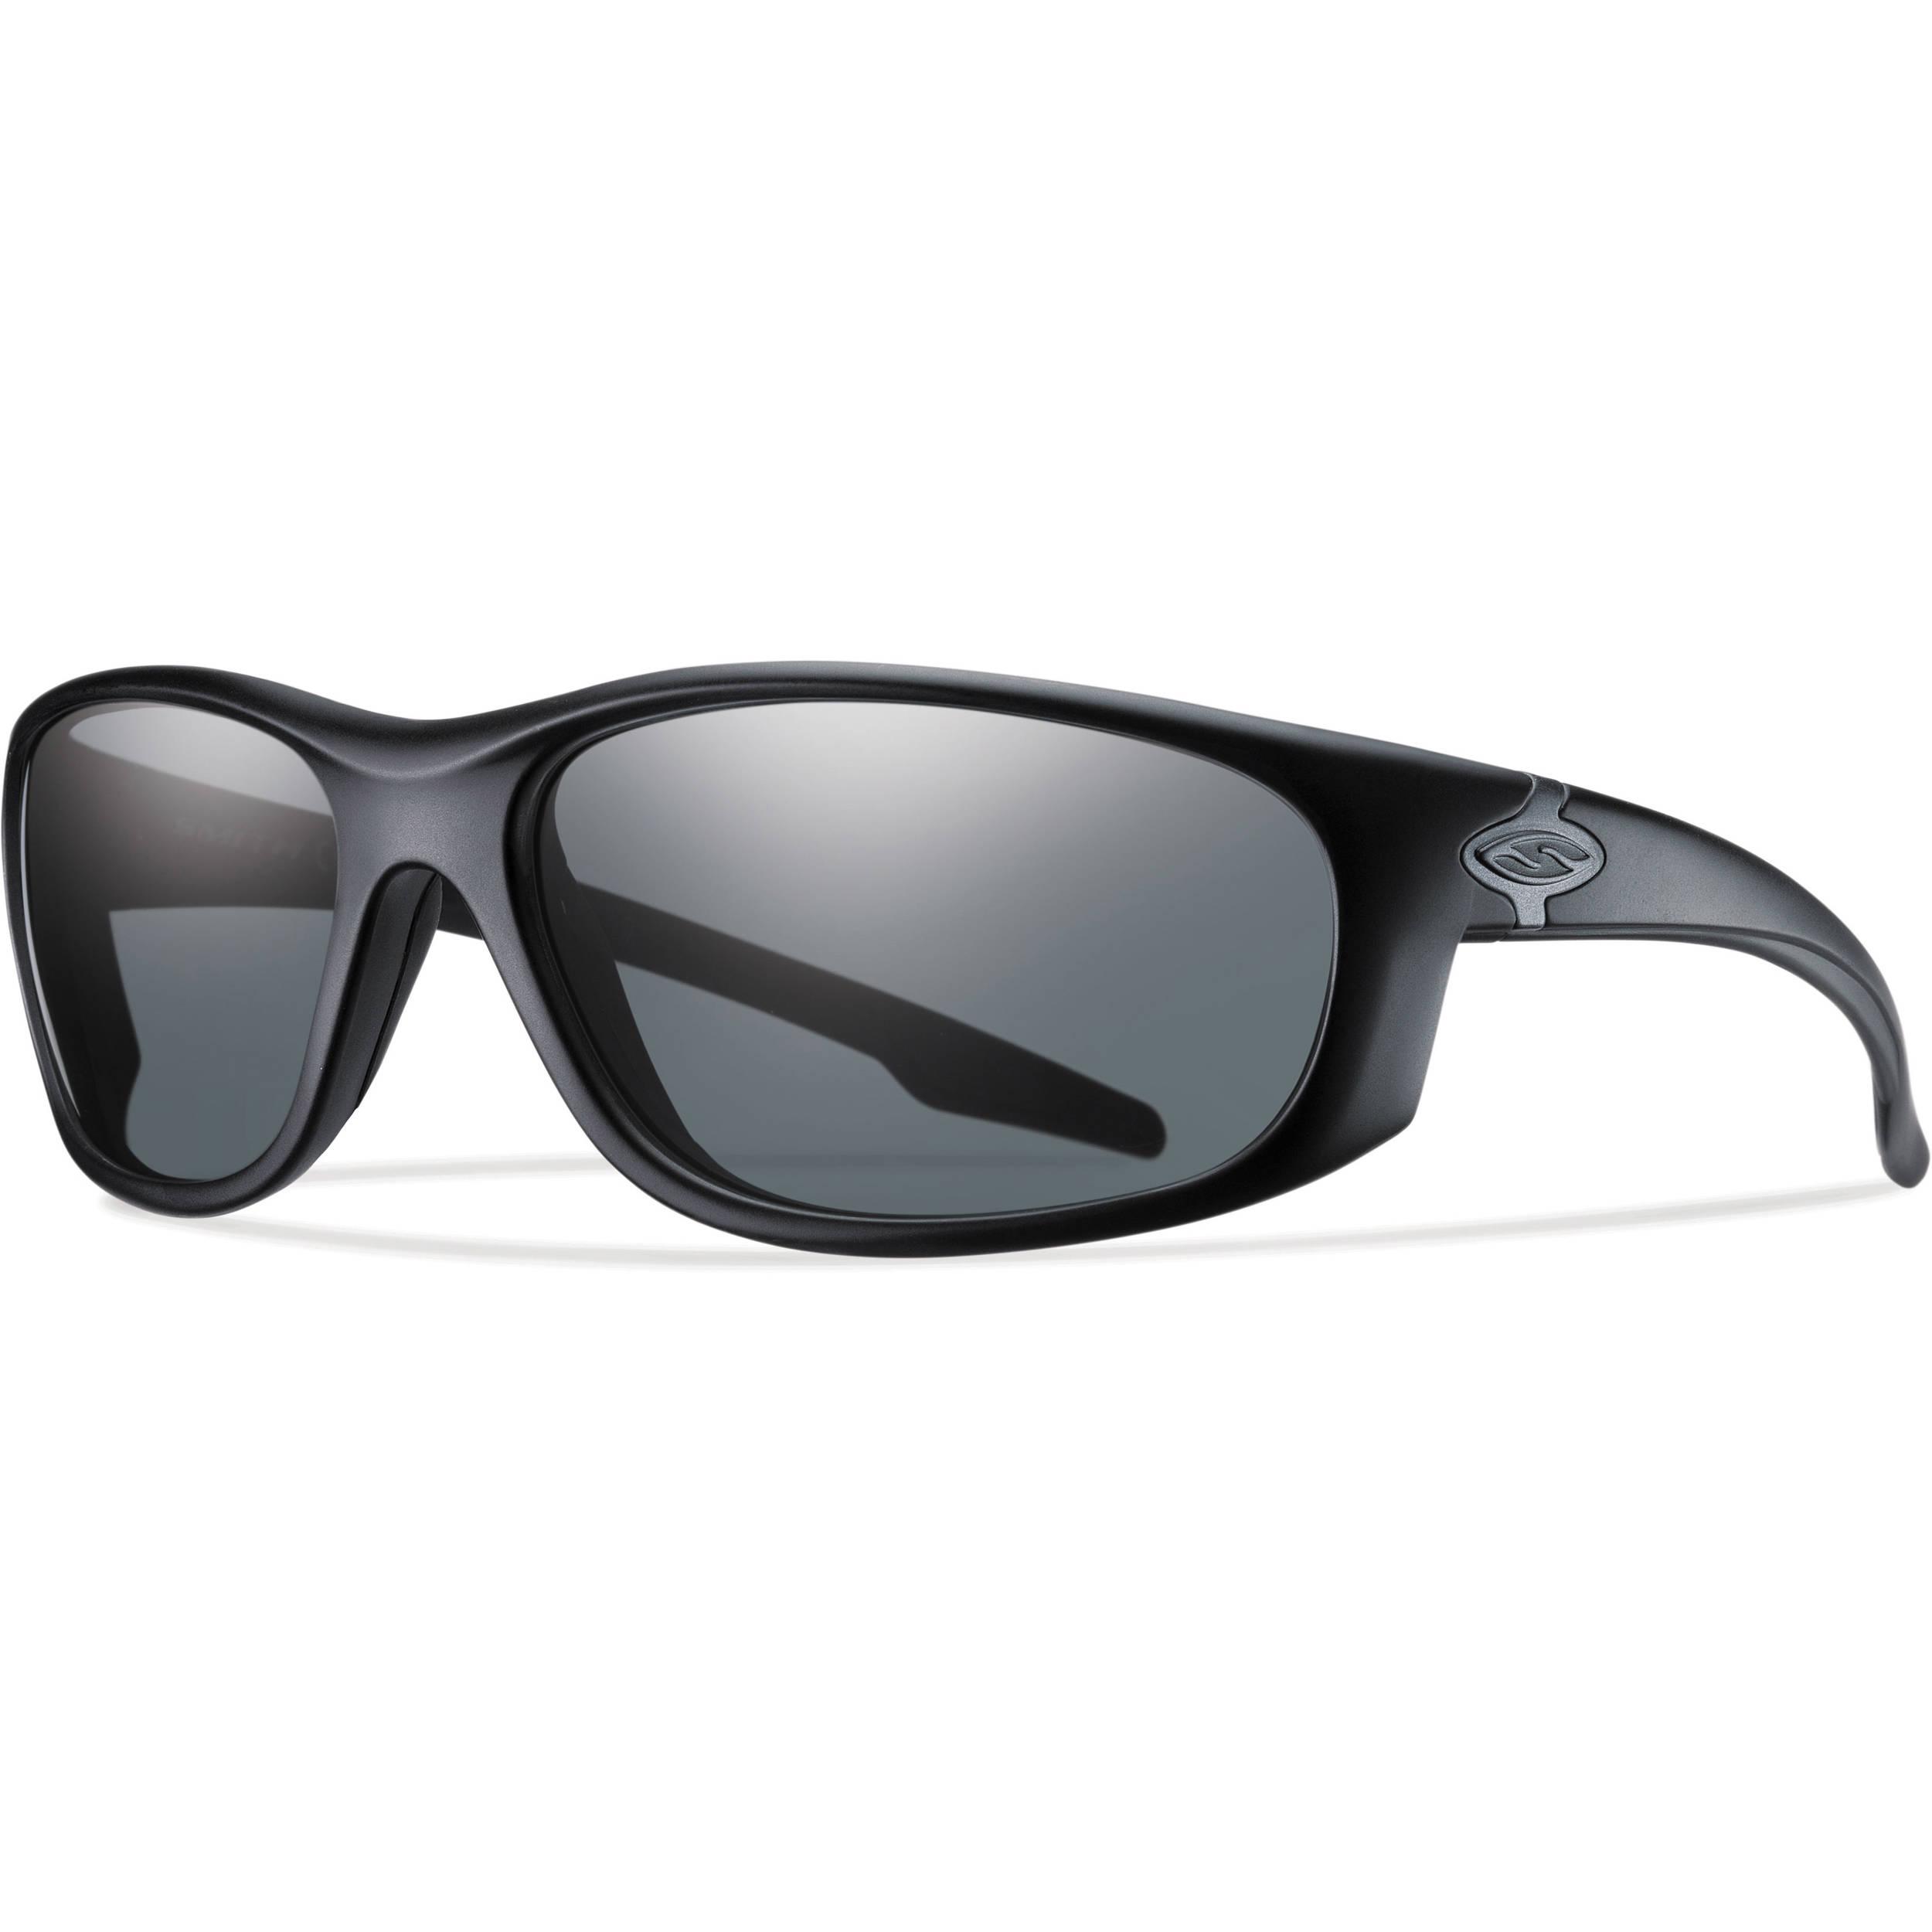 ba258258ef Smith Optics Chamber Elite Tactical Sunglasses (Black - Polarized Gray Lens)